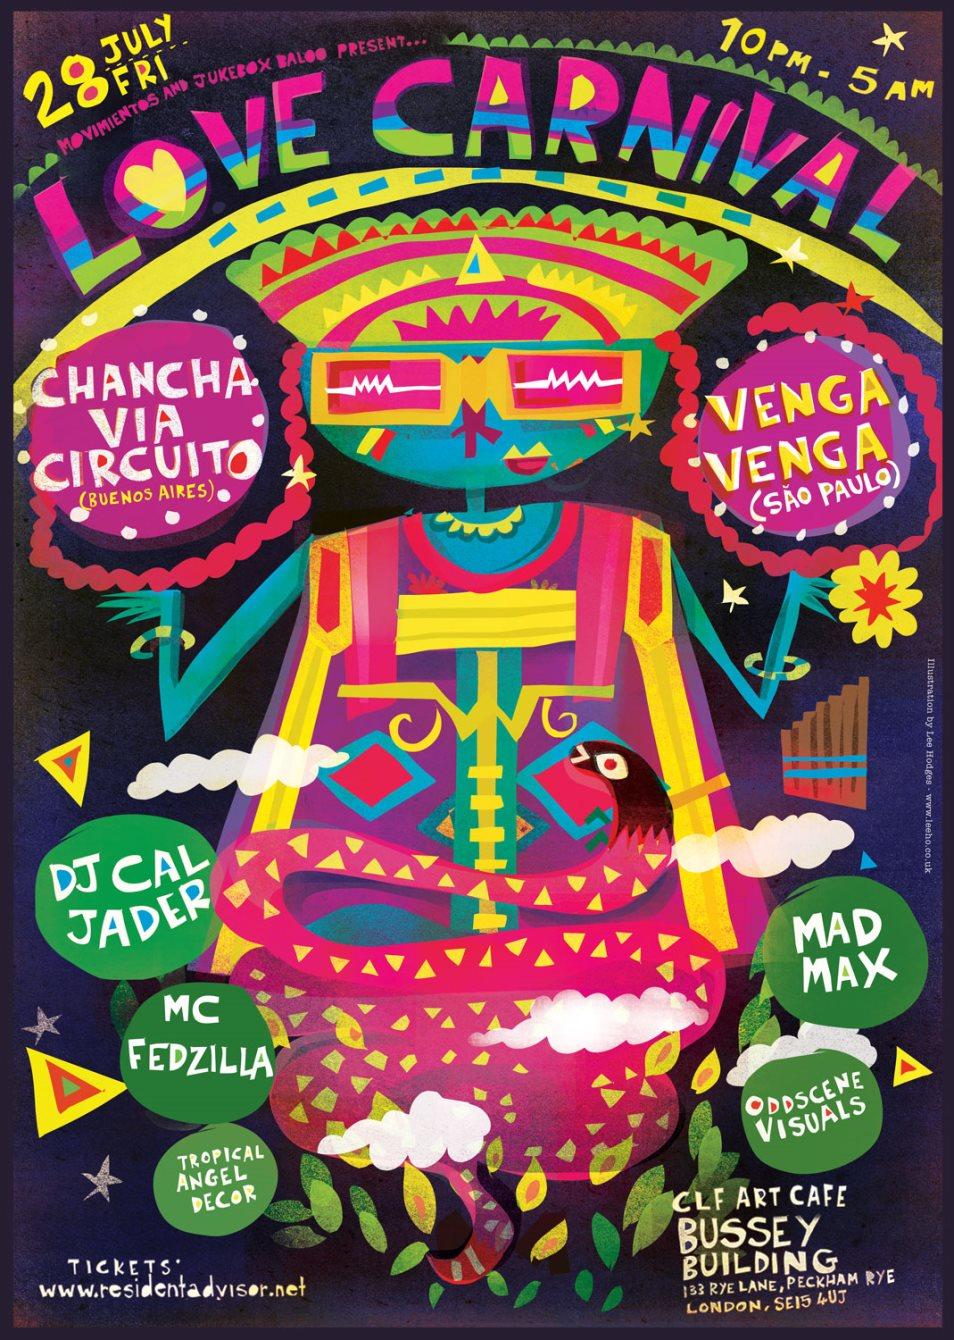 Love Carnival presents Chancha Via Circuito - Flyer back